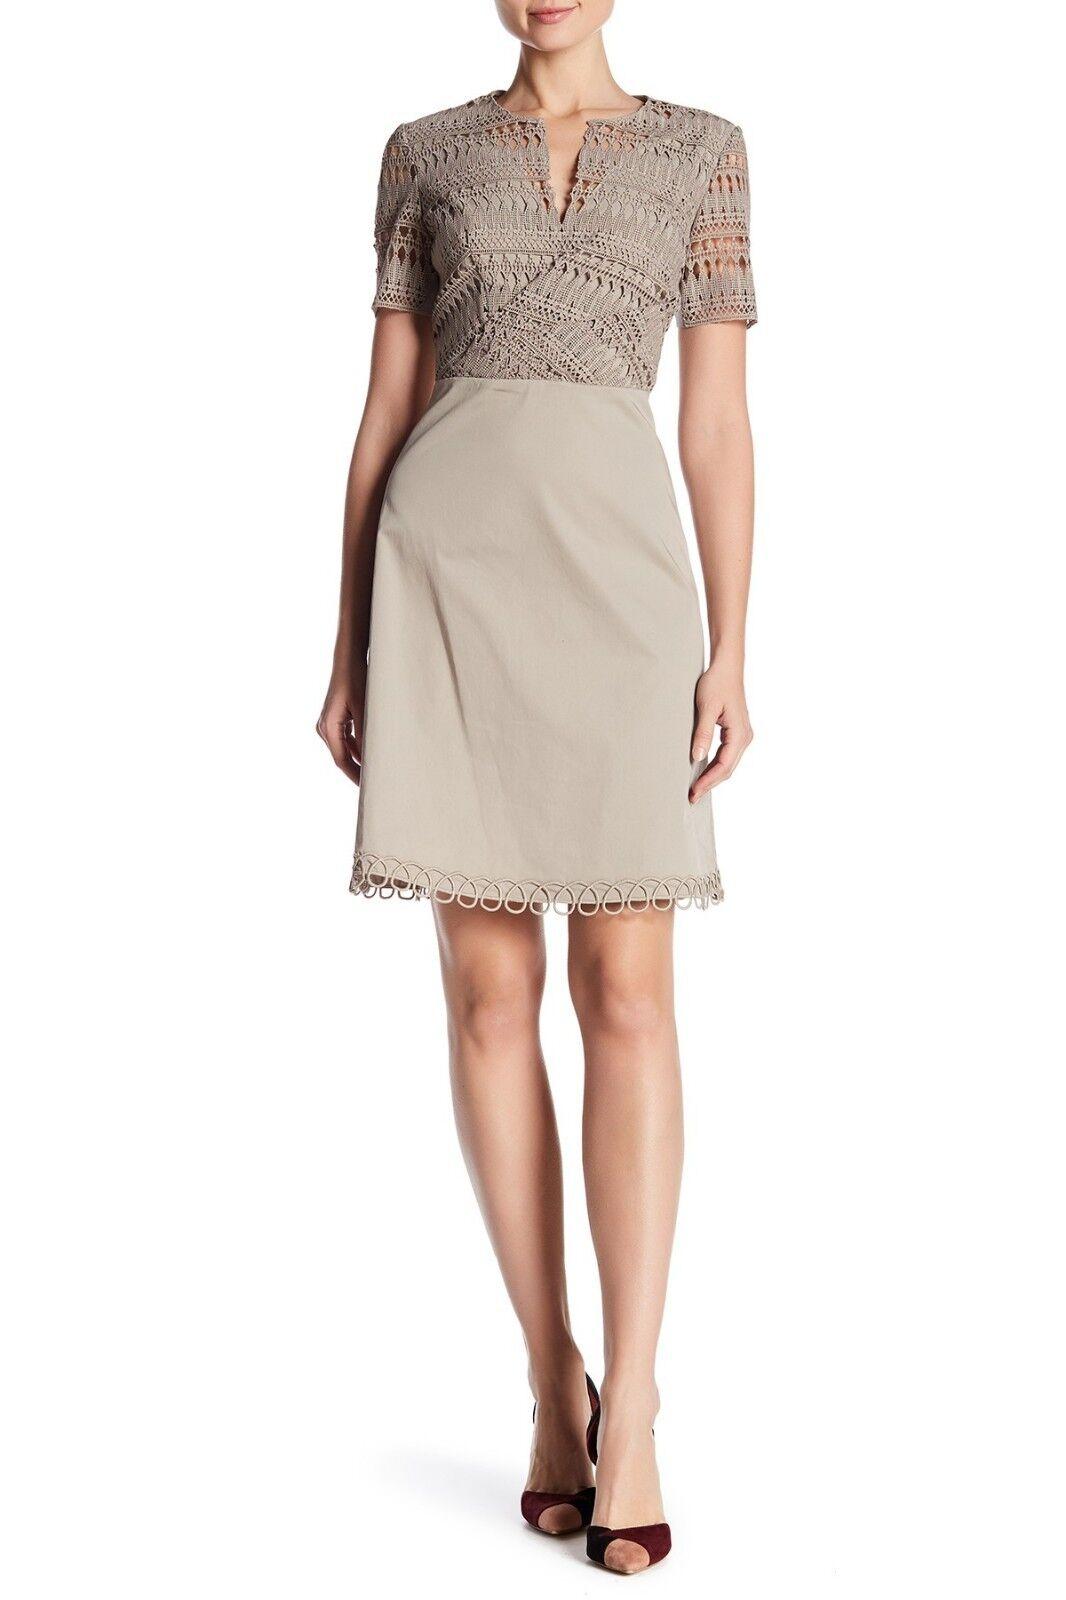 Elie Tahari Kinley Crochet Bodice Dress (size 14) 14) 14) 65ed35